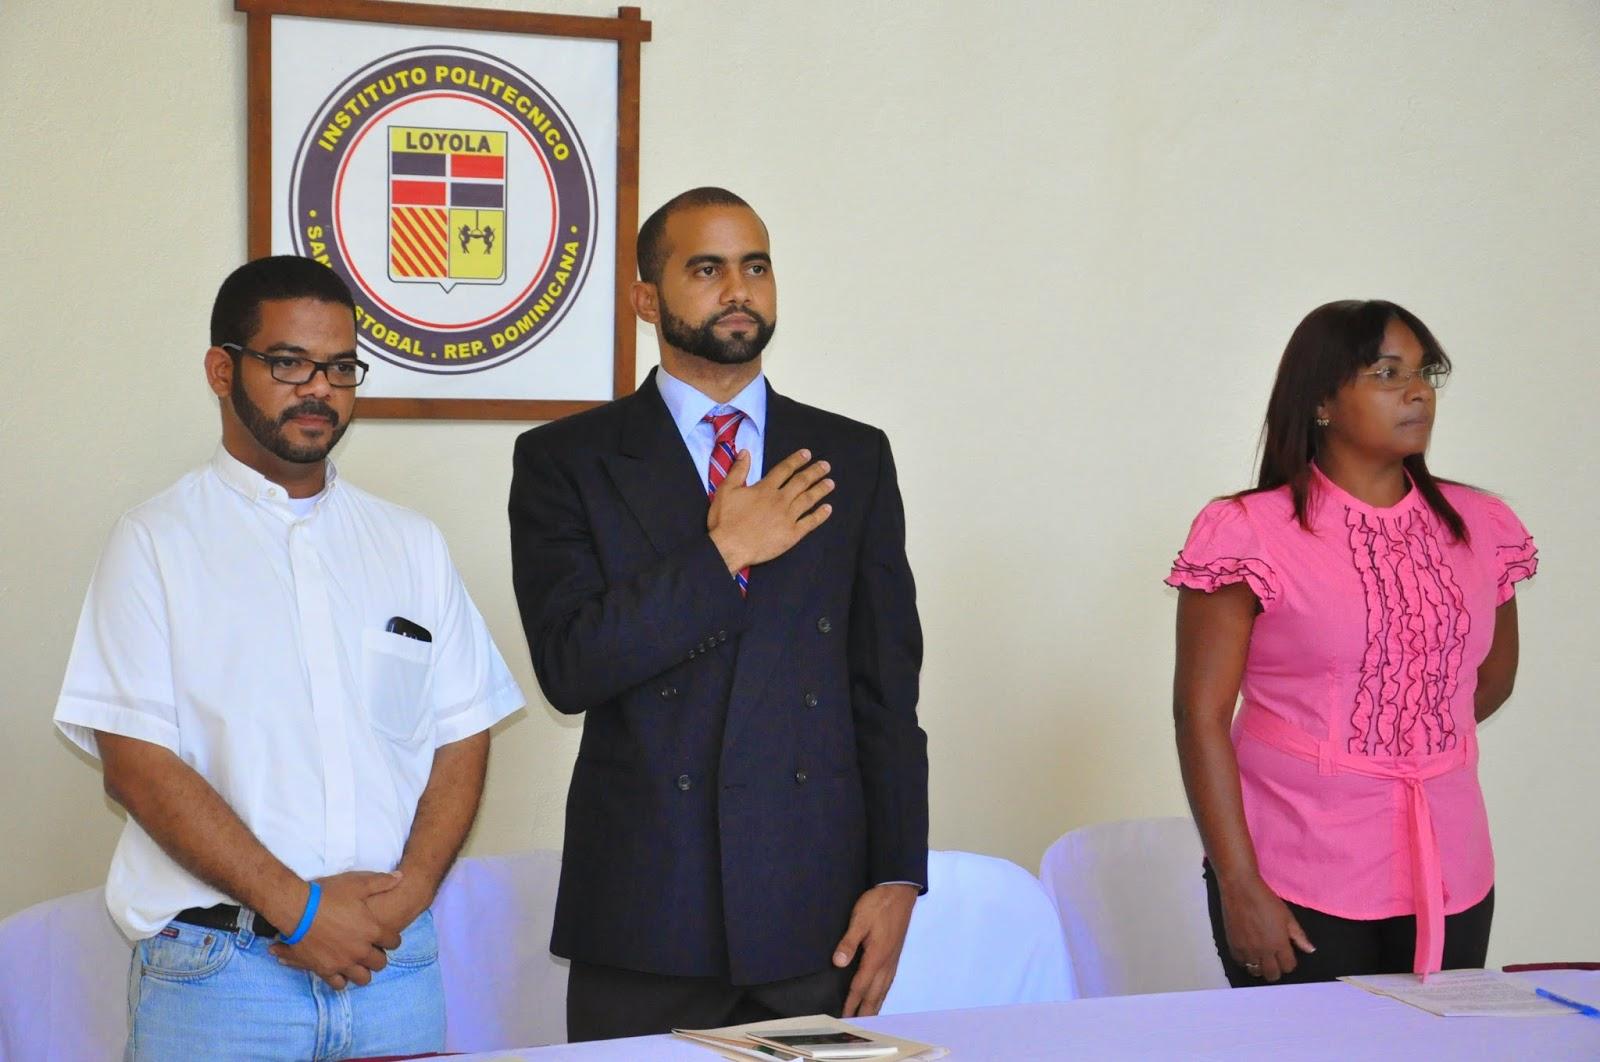 Poetas dominicanos Neftalí Eugenia y Cristino Alberto Gómez